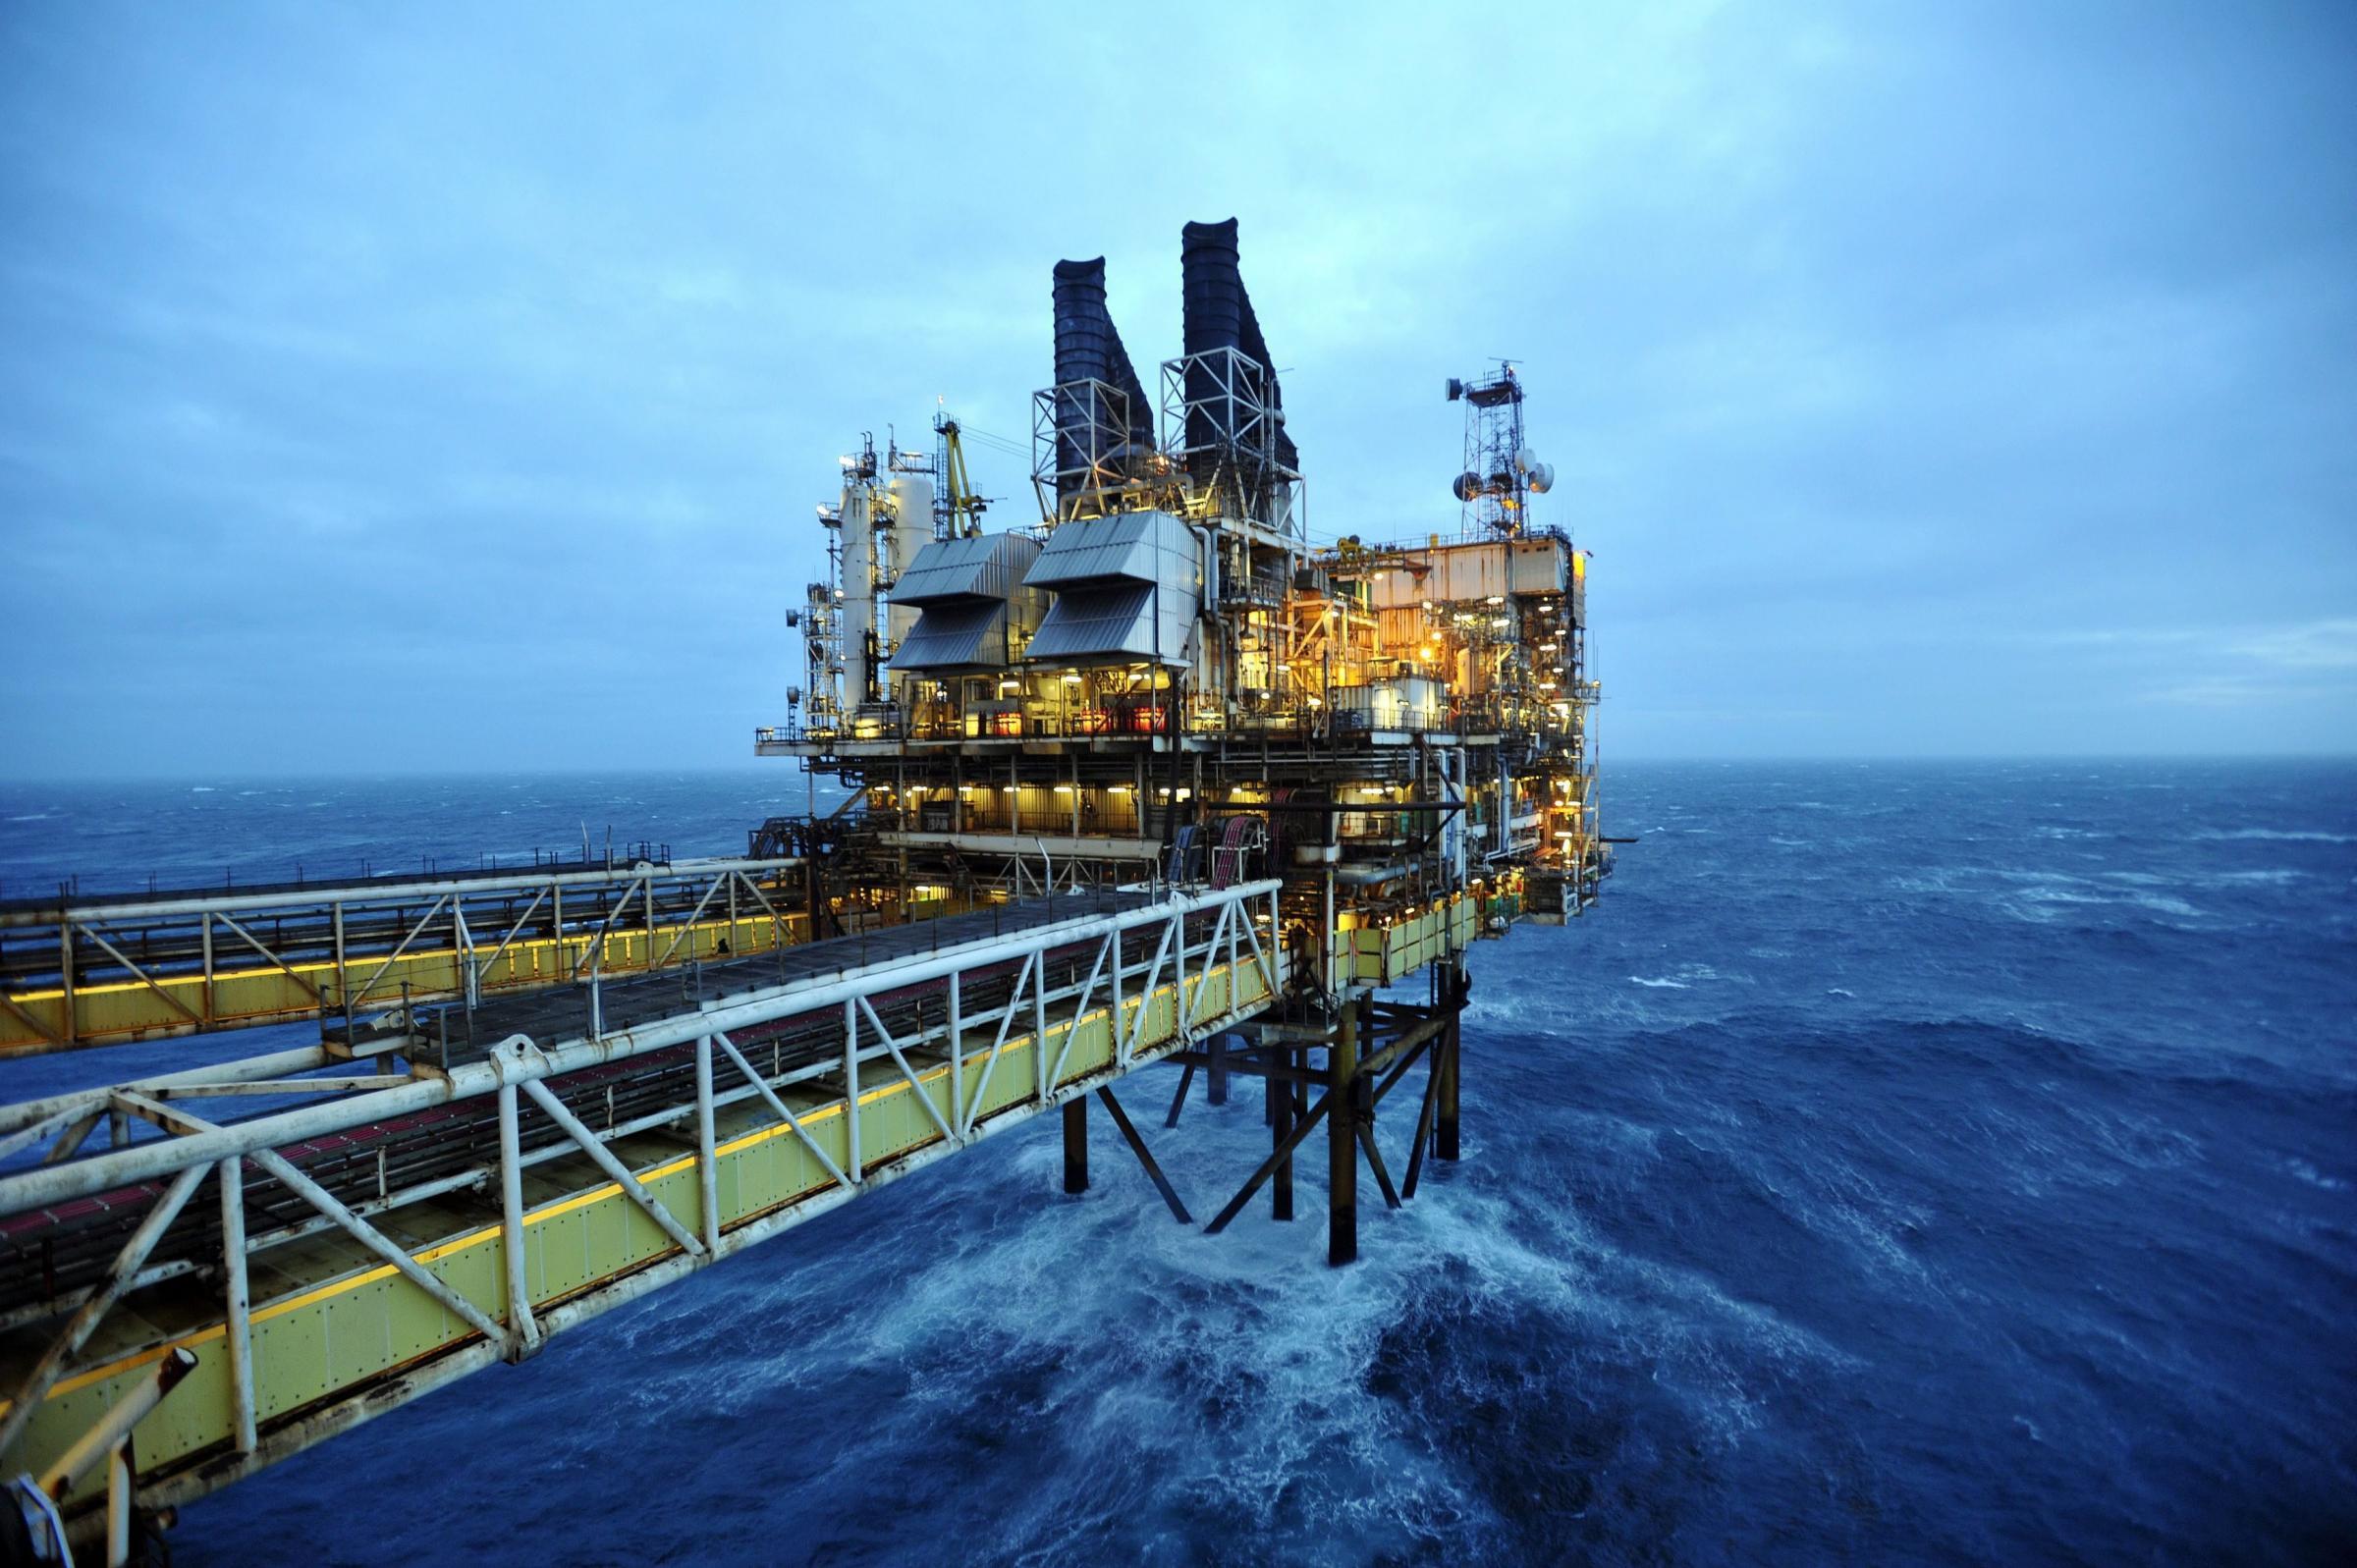 North Sea exploration interest increases amid crude price rally